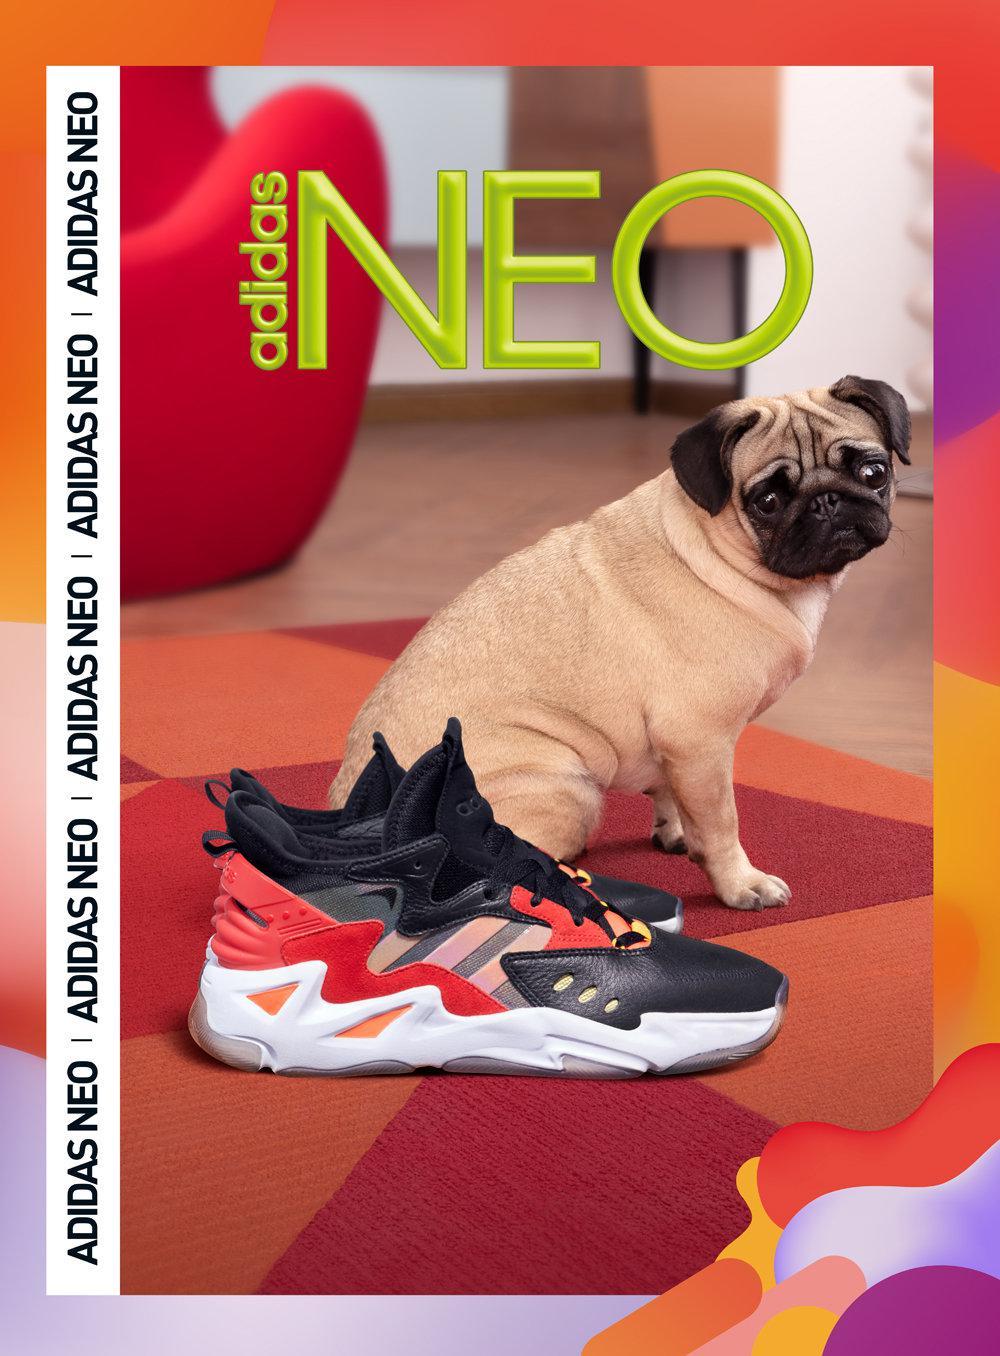 adidas neo FIREWALKER焱系列滚烫登场,火力全开